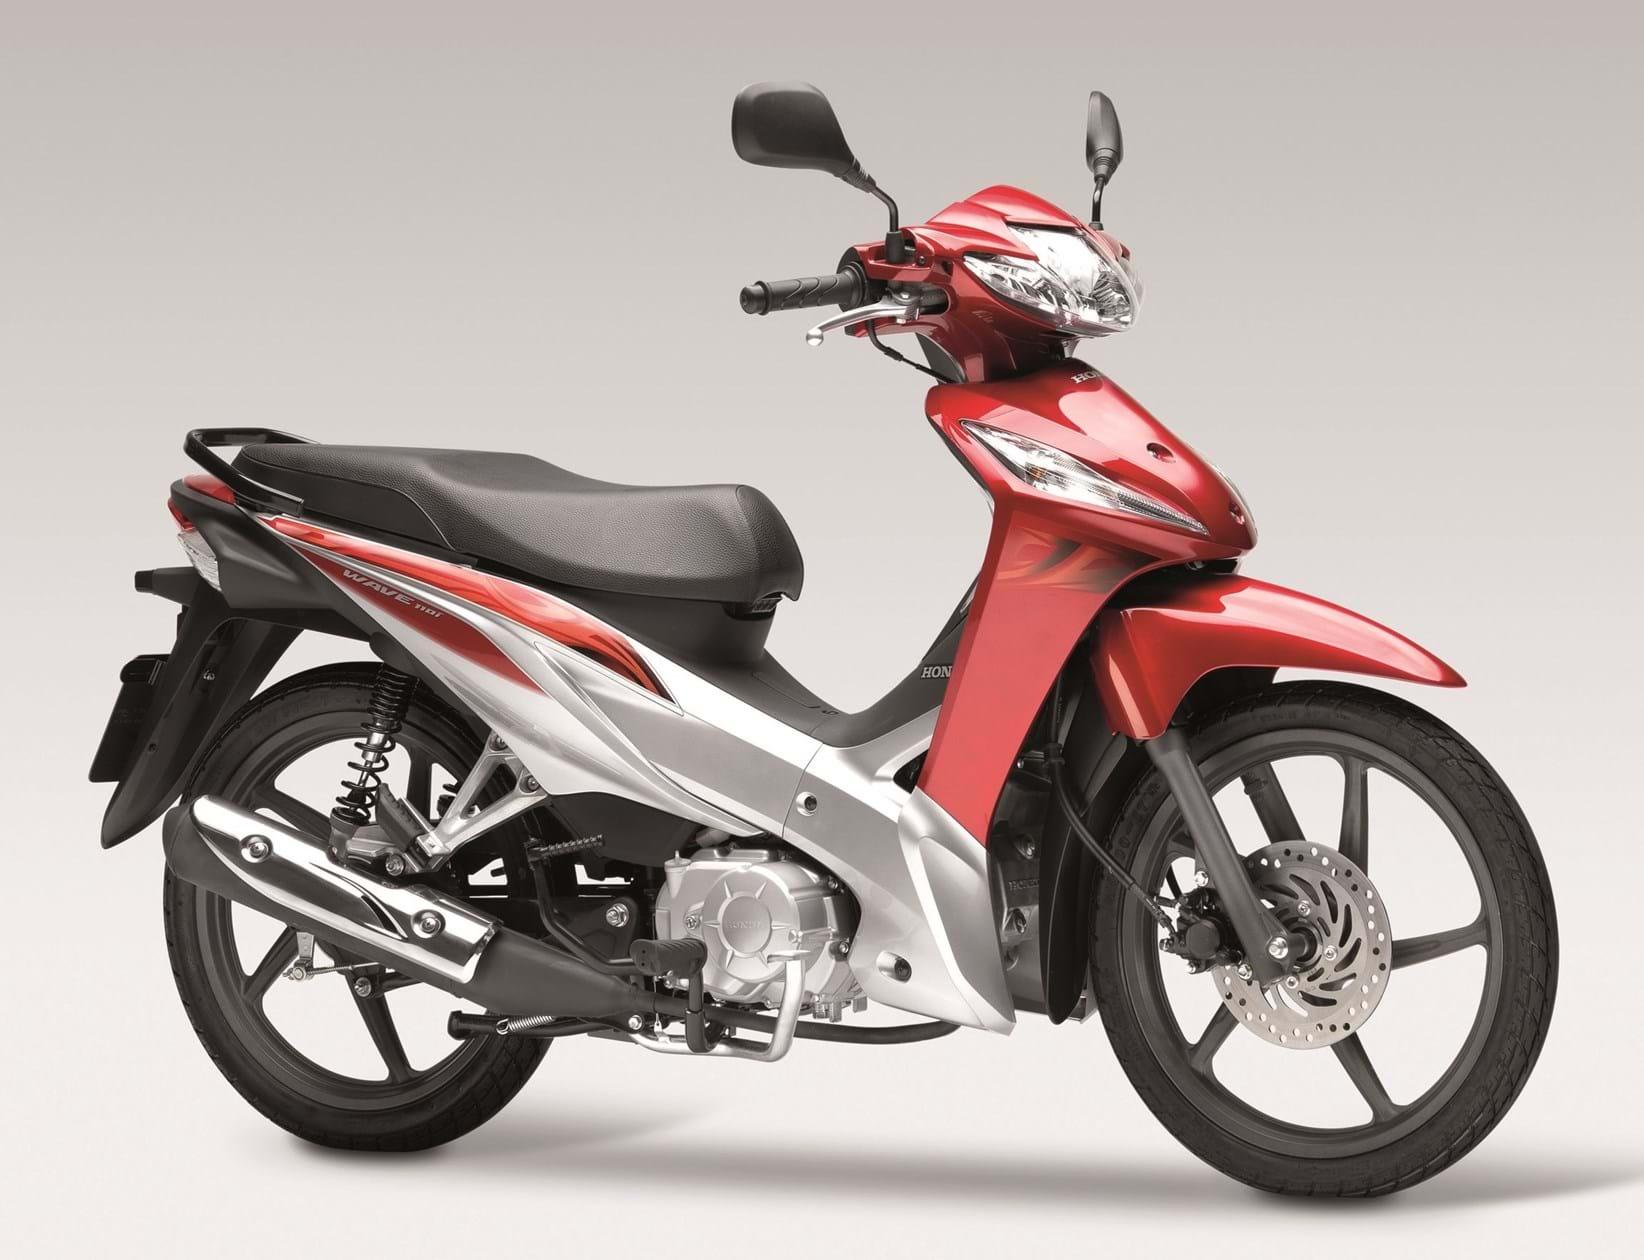 For Sale: Honda Wave • The Bike Market